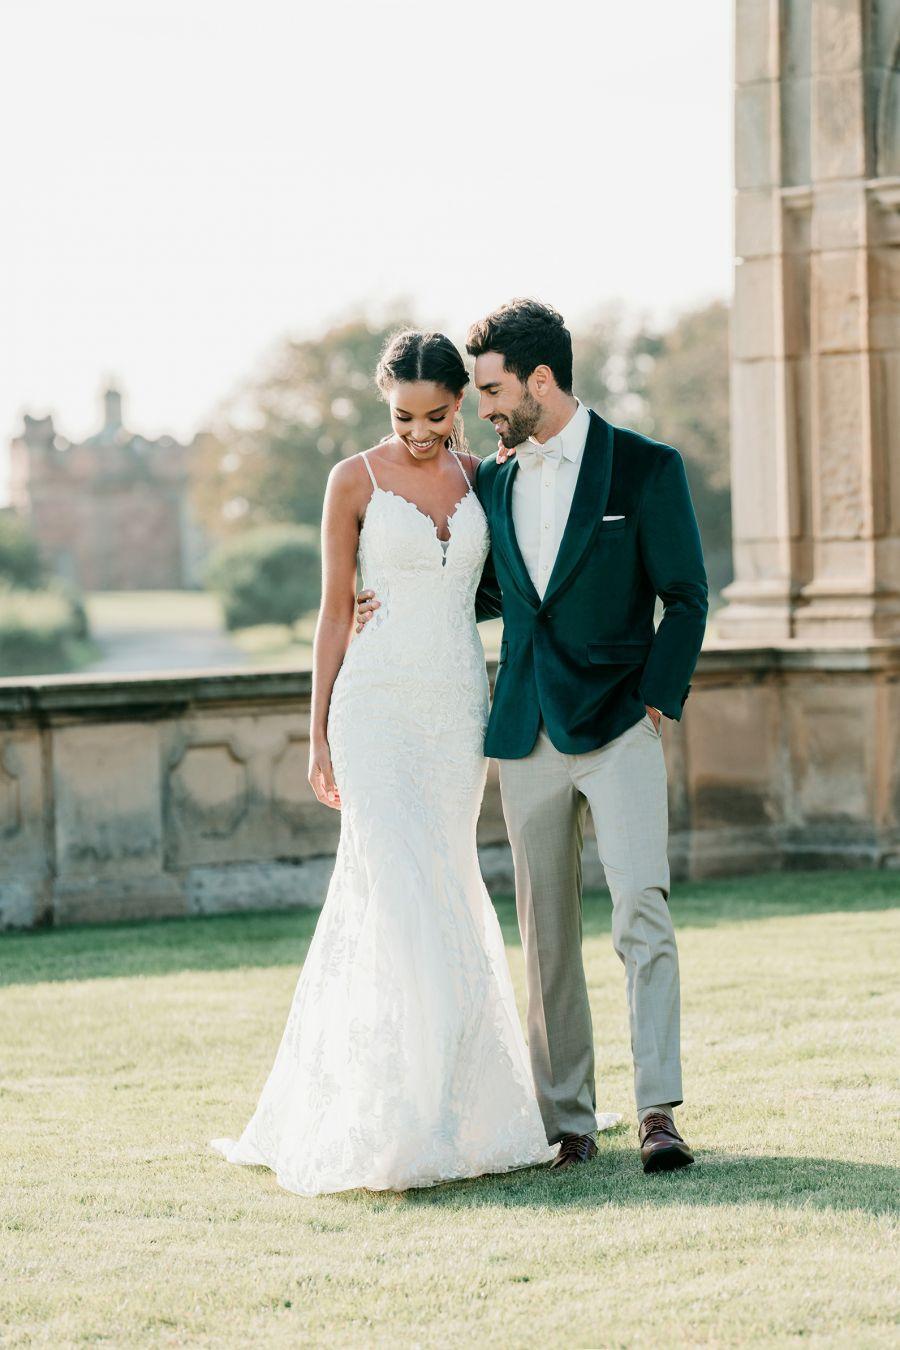 Allure 9711 Sz 18 Sand Ivory 1398 Available At Debra S Bridal Jacksonville Fl 32256 Contact Allure Bridal Fairy Tale Wedding Dress Elegant Bridal Gown [ 1350 x 900 Pixel ]